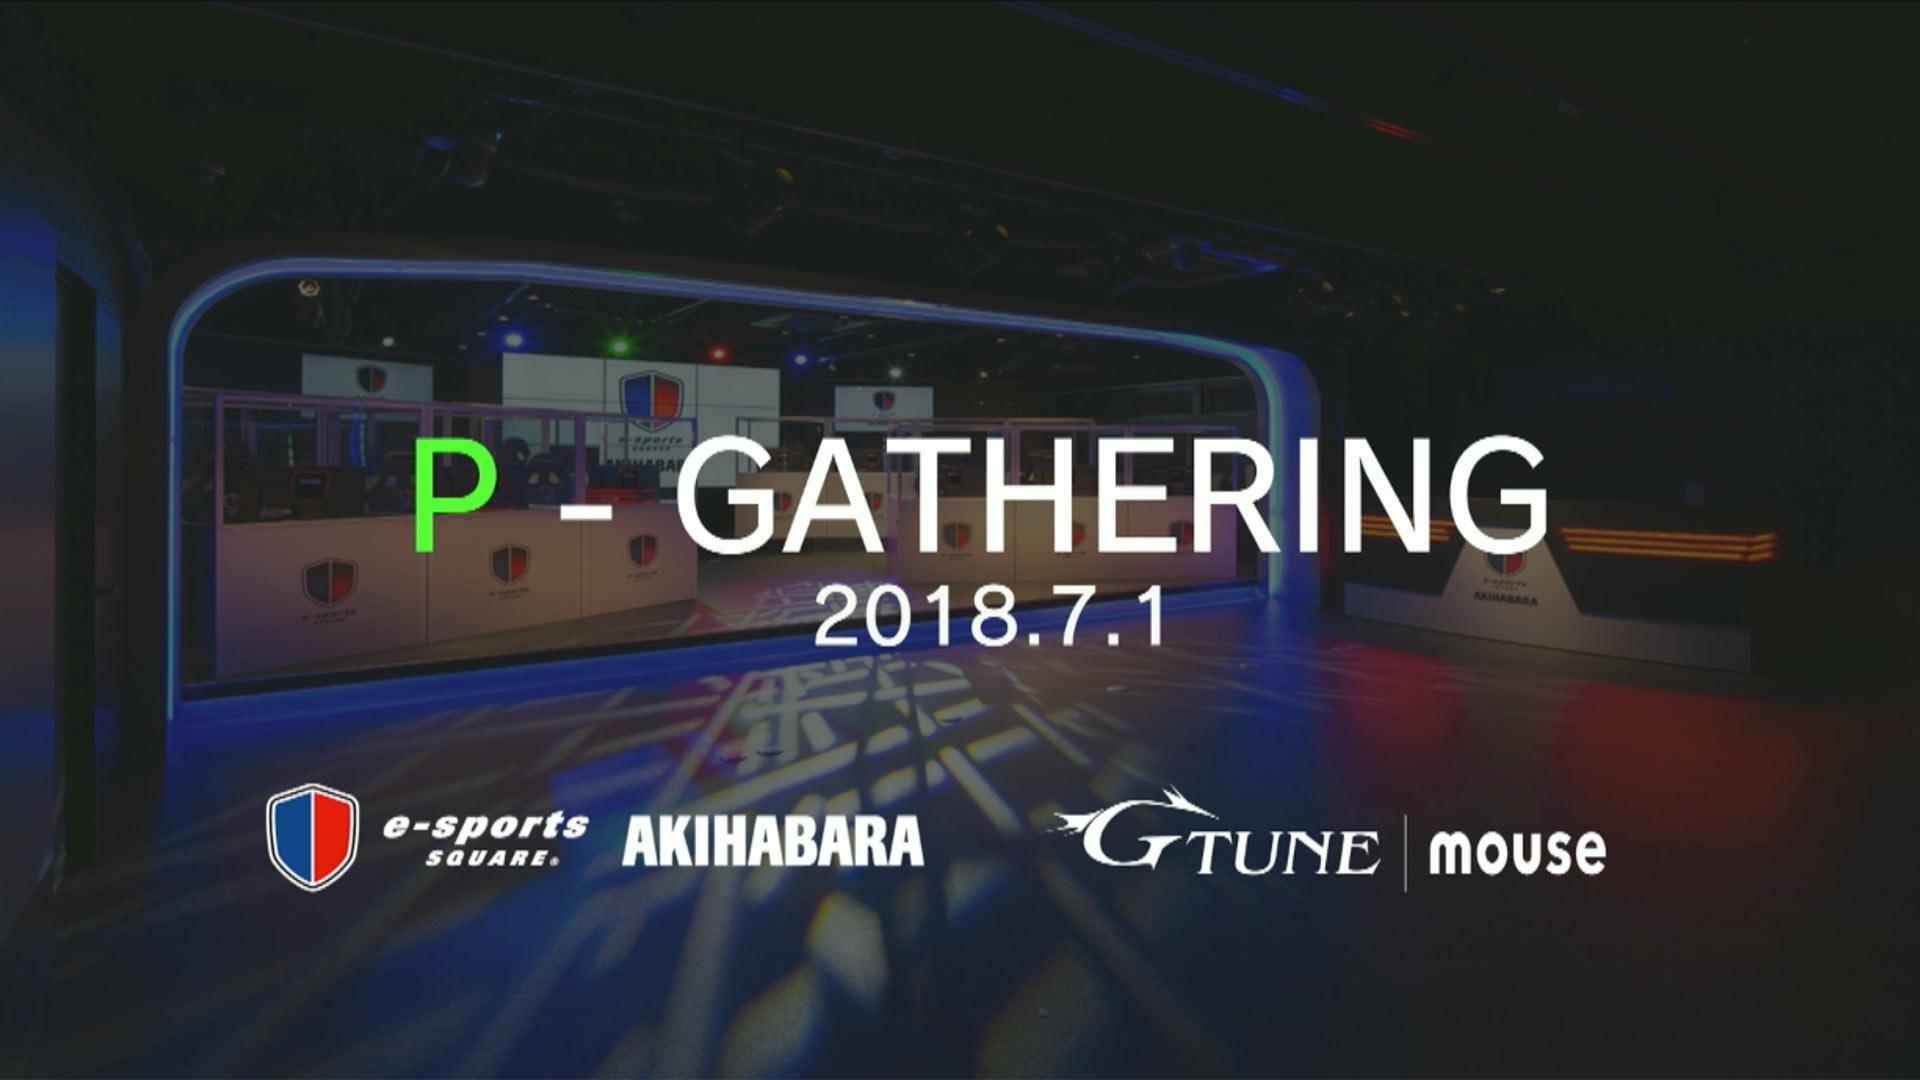 yakou選手が『P-GATHERING』に出演